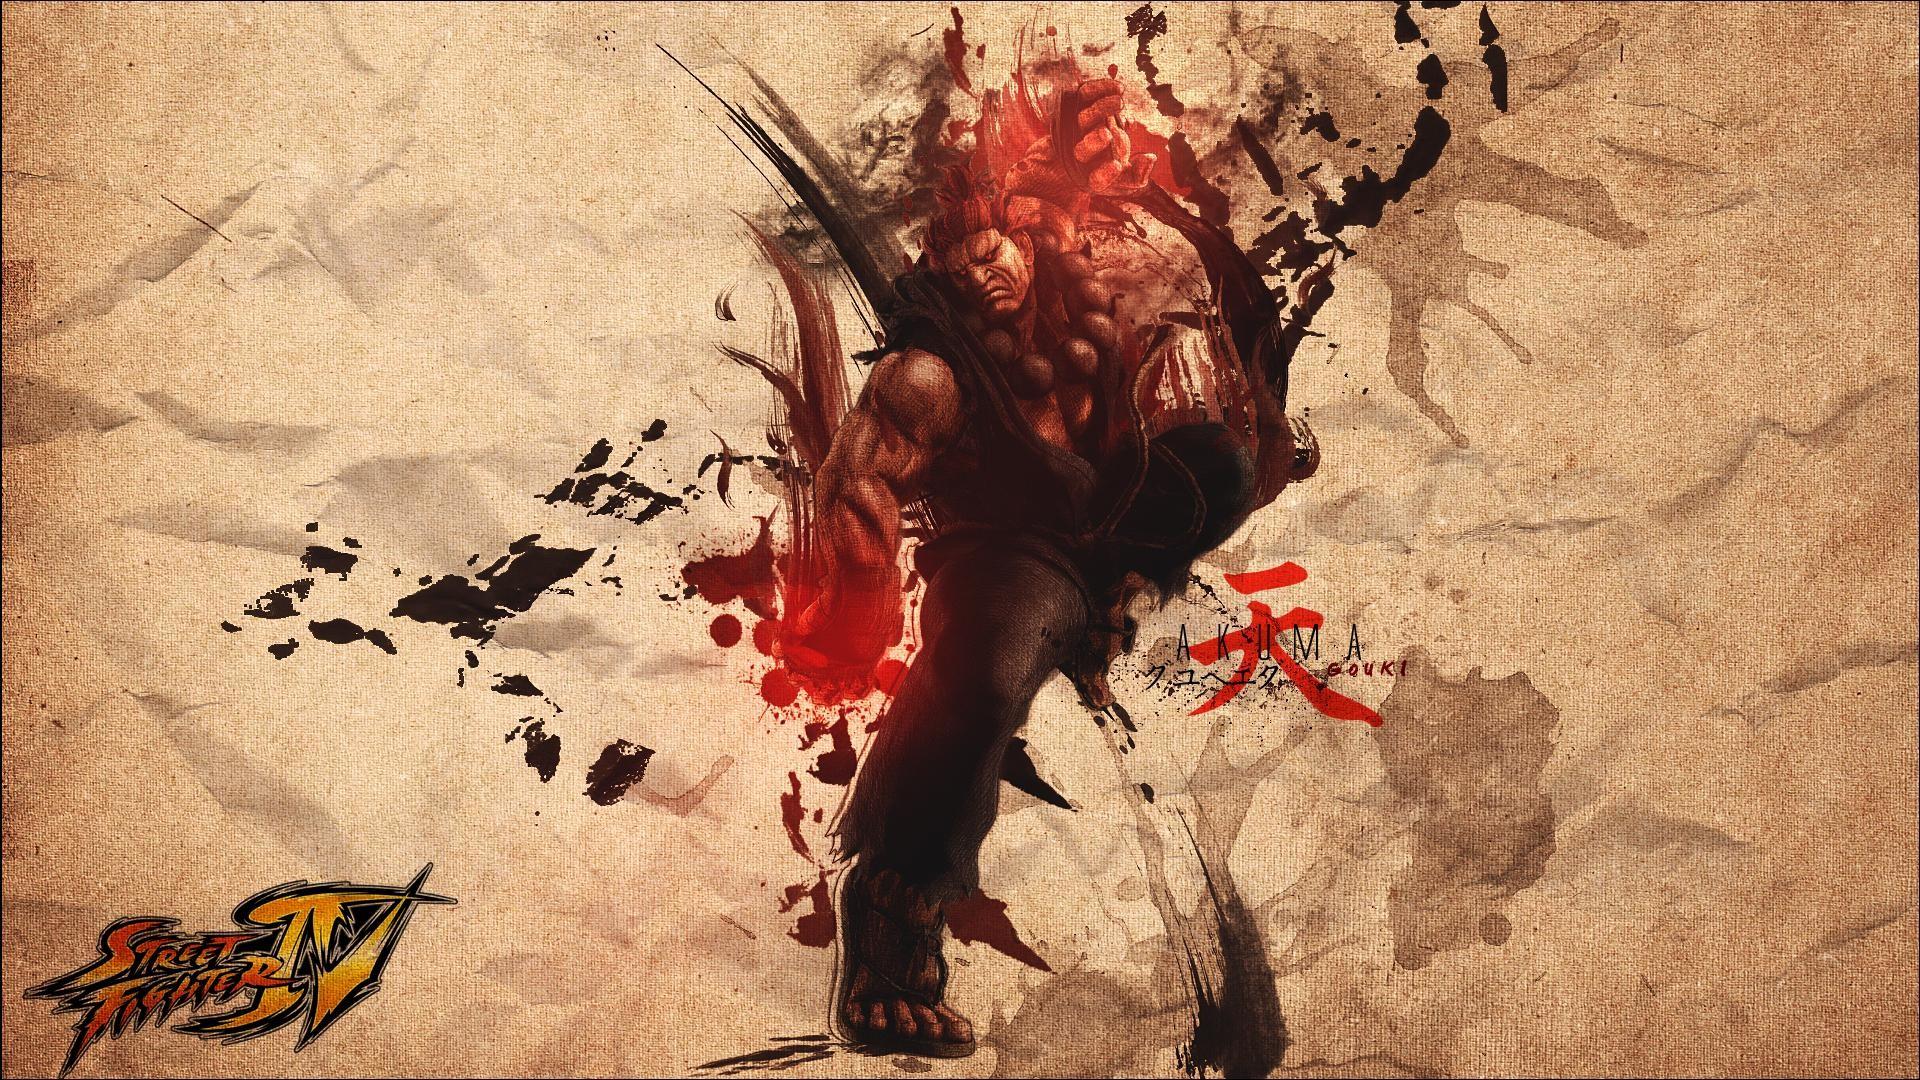 wallpaper.wiki-HD-Akuma-Street-Fighter-Background-PIC-